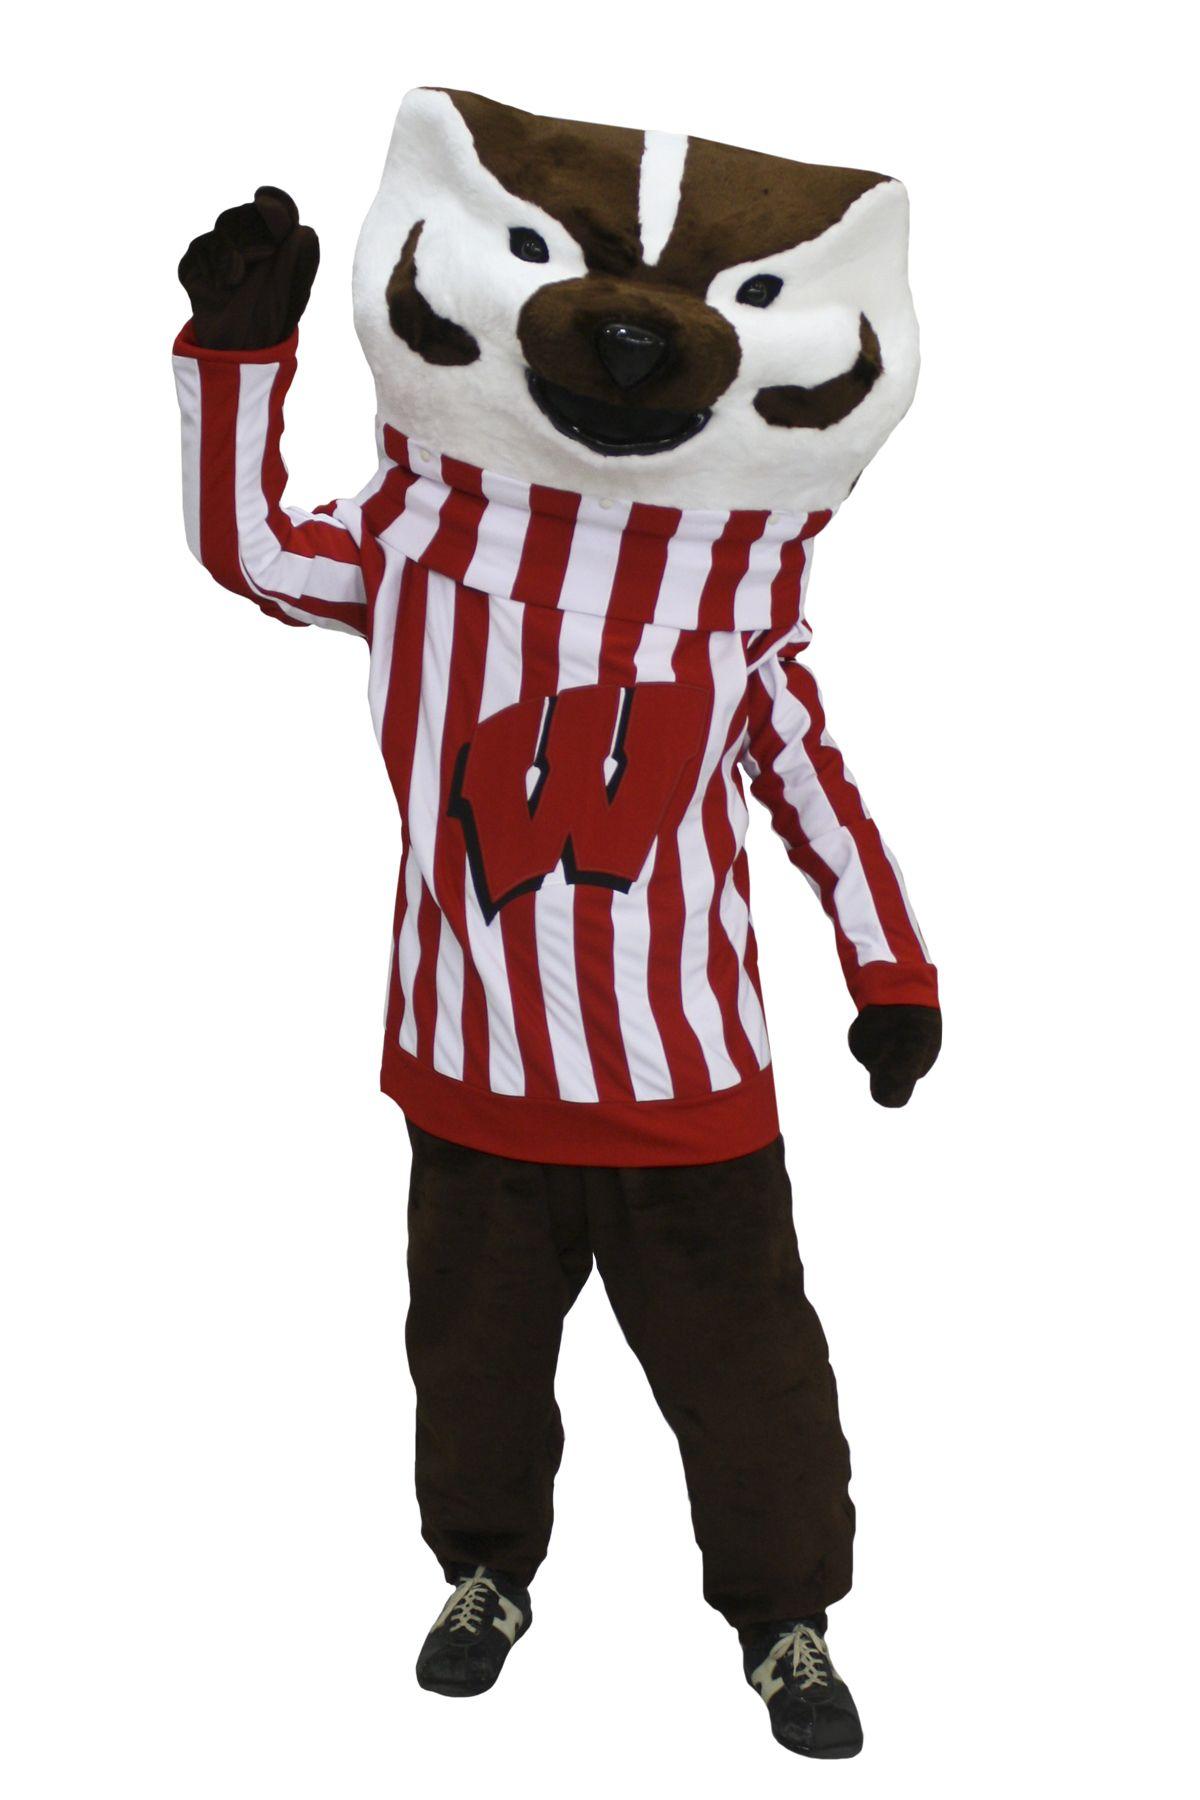 Bucky Badger mascot costume Mascot costumes, Costumes